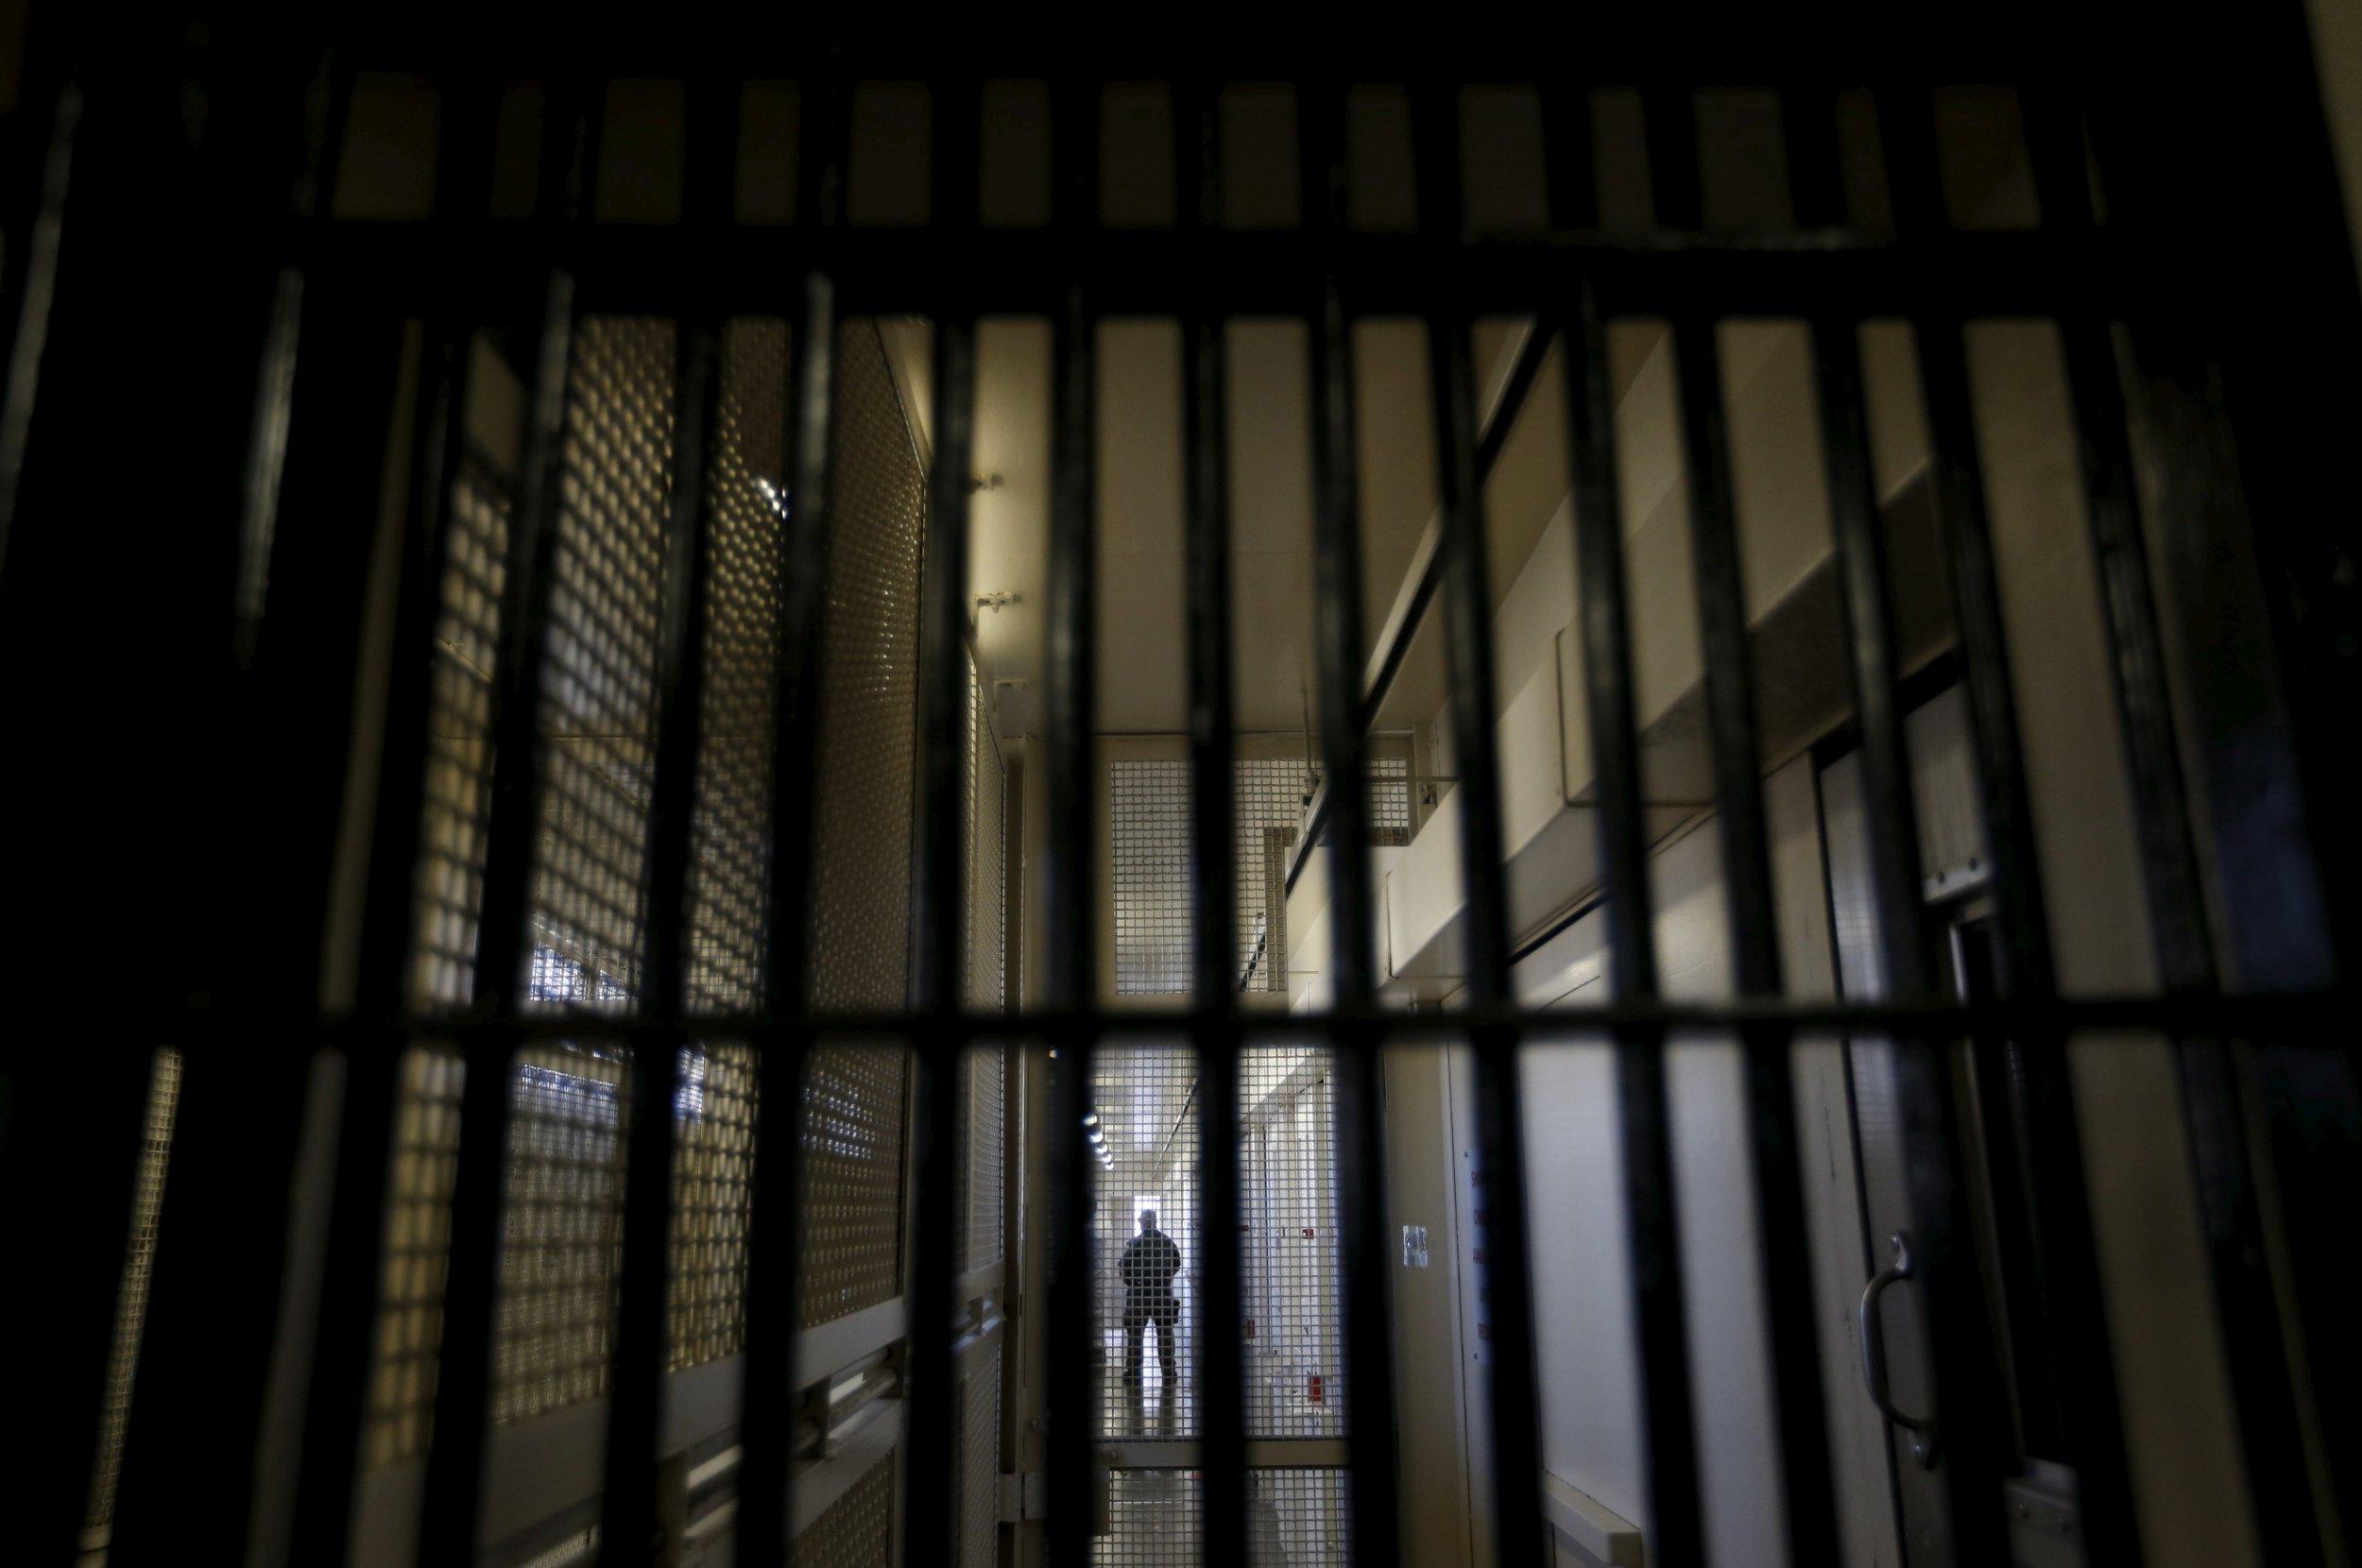 12_30_Prisoners_01